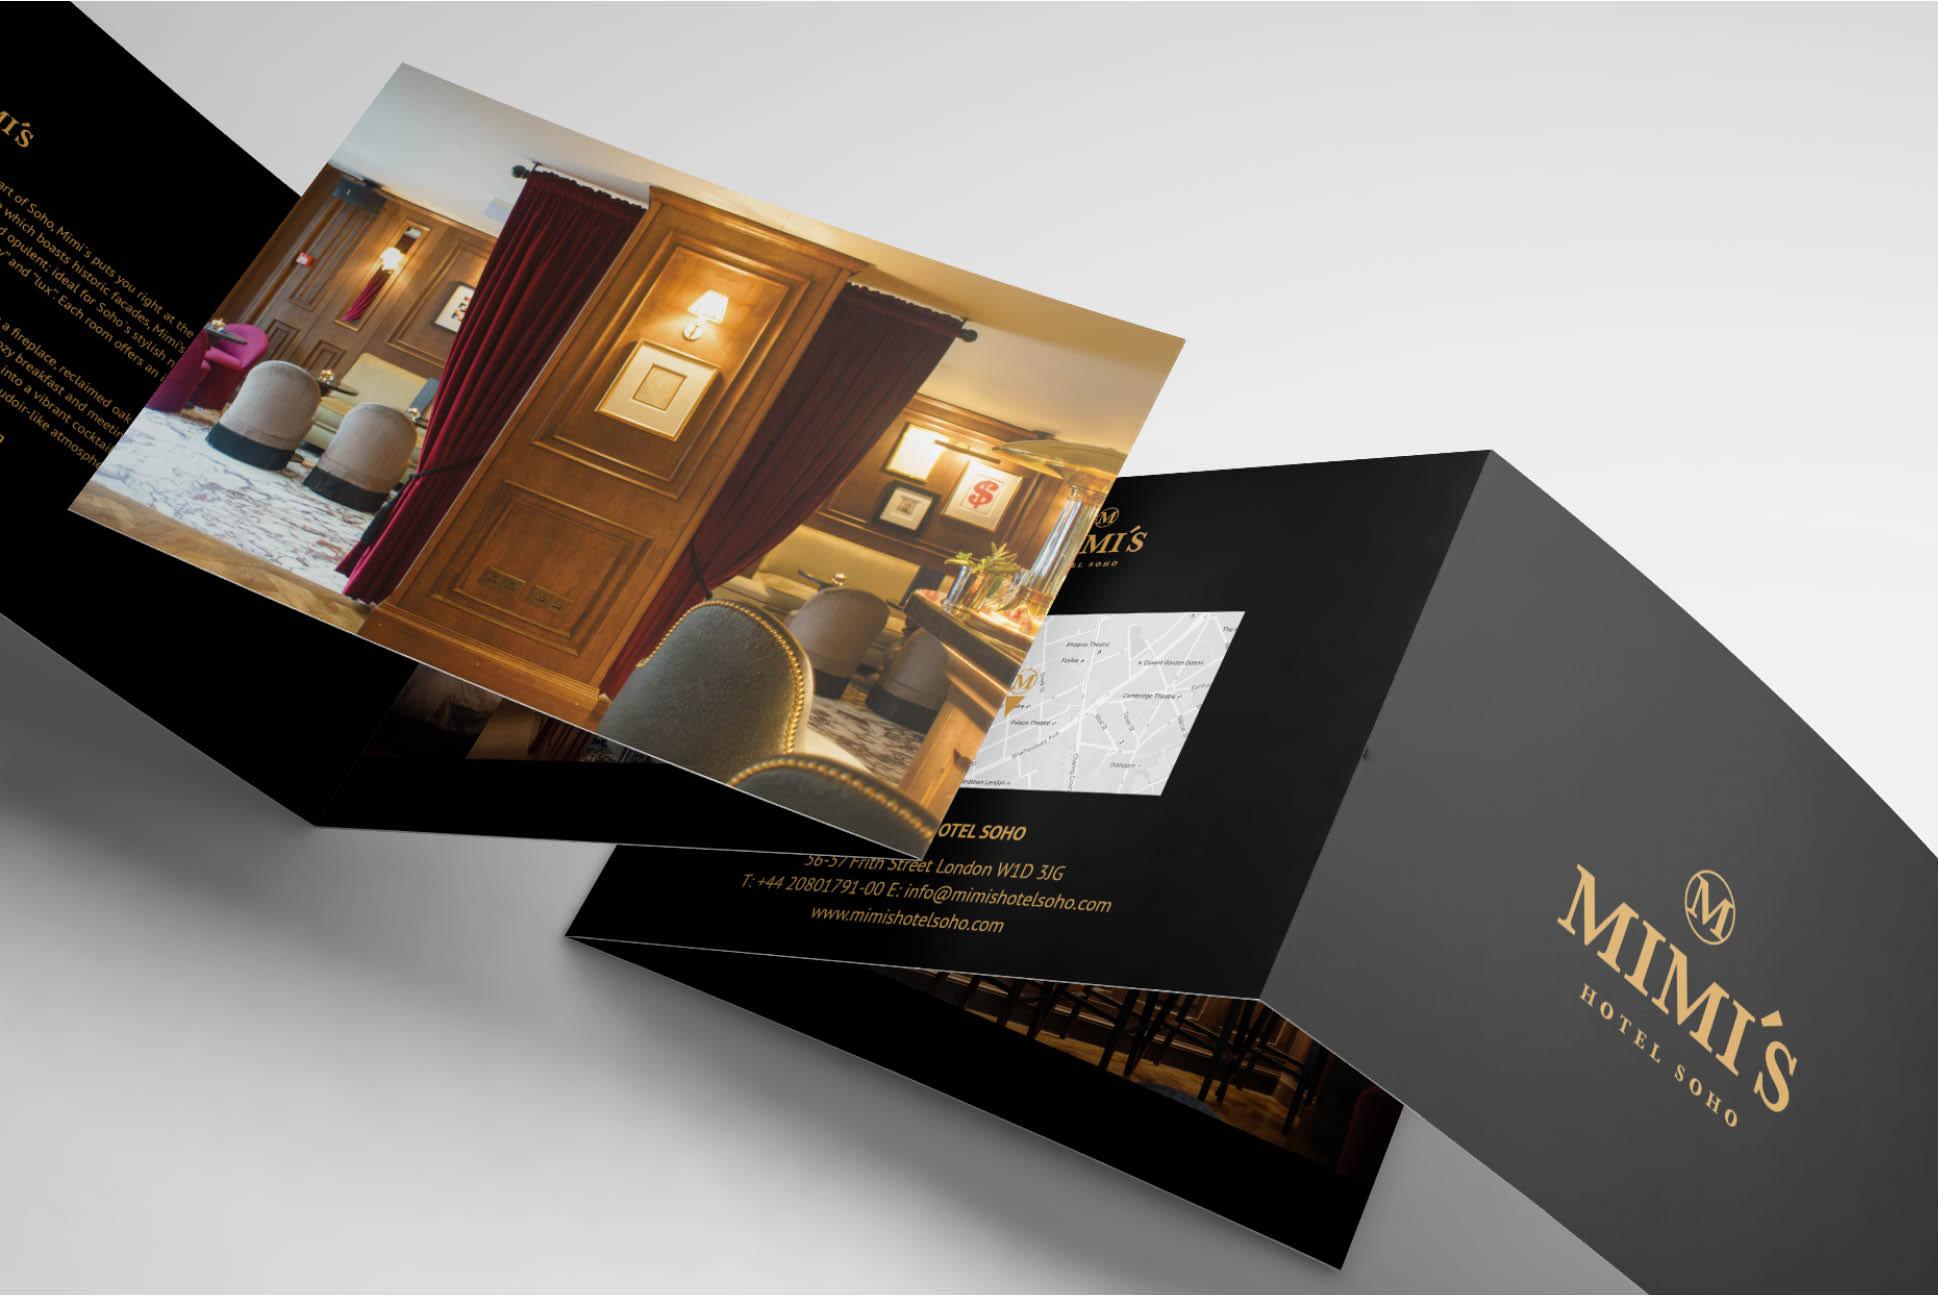 Mimi's Hotel Soho brochure | | Independent Marketing - IM London | Hospitality and Hotel Branding